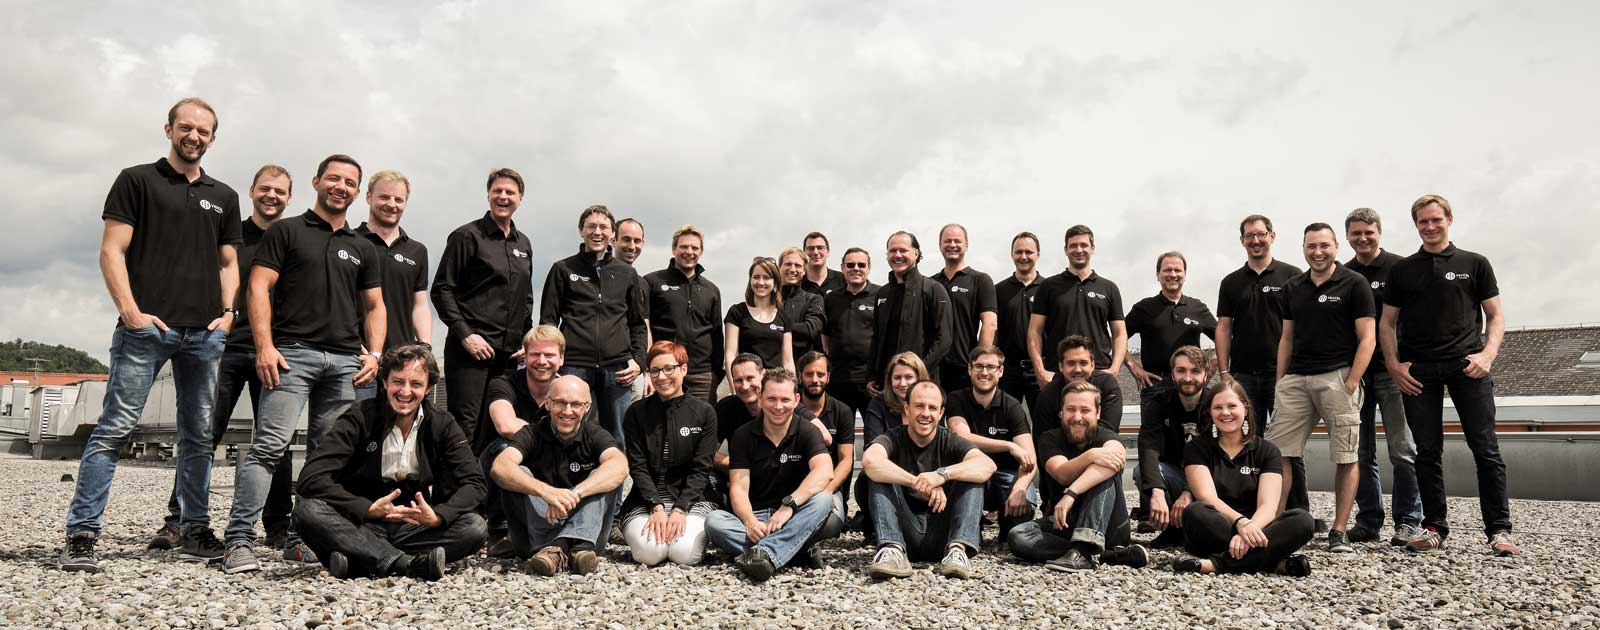 The Vexcel Imaging team based in Graz, Austria